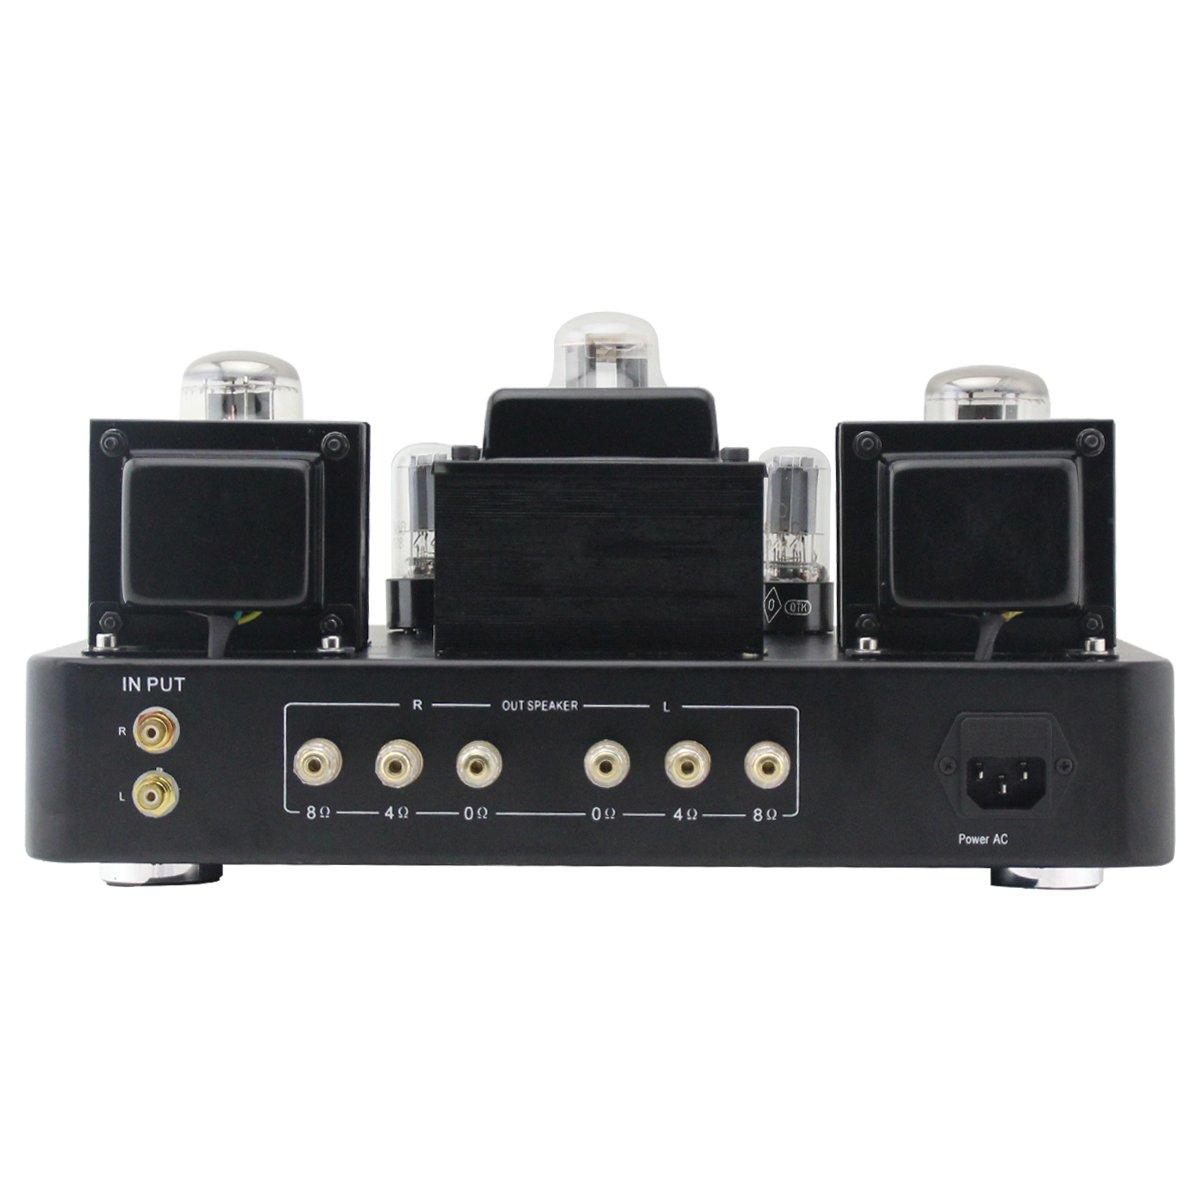 Gemtune Gs 02m Hi Fi Integrated Tube Amplifier W Vu The Configuration Is Classic Power Supply 5y3 Rectifier Level Metertube Kt88x2 6h8cx2 5z3px1 Electronics